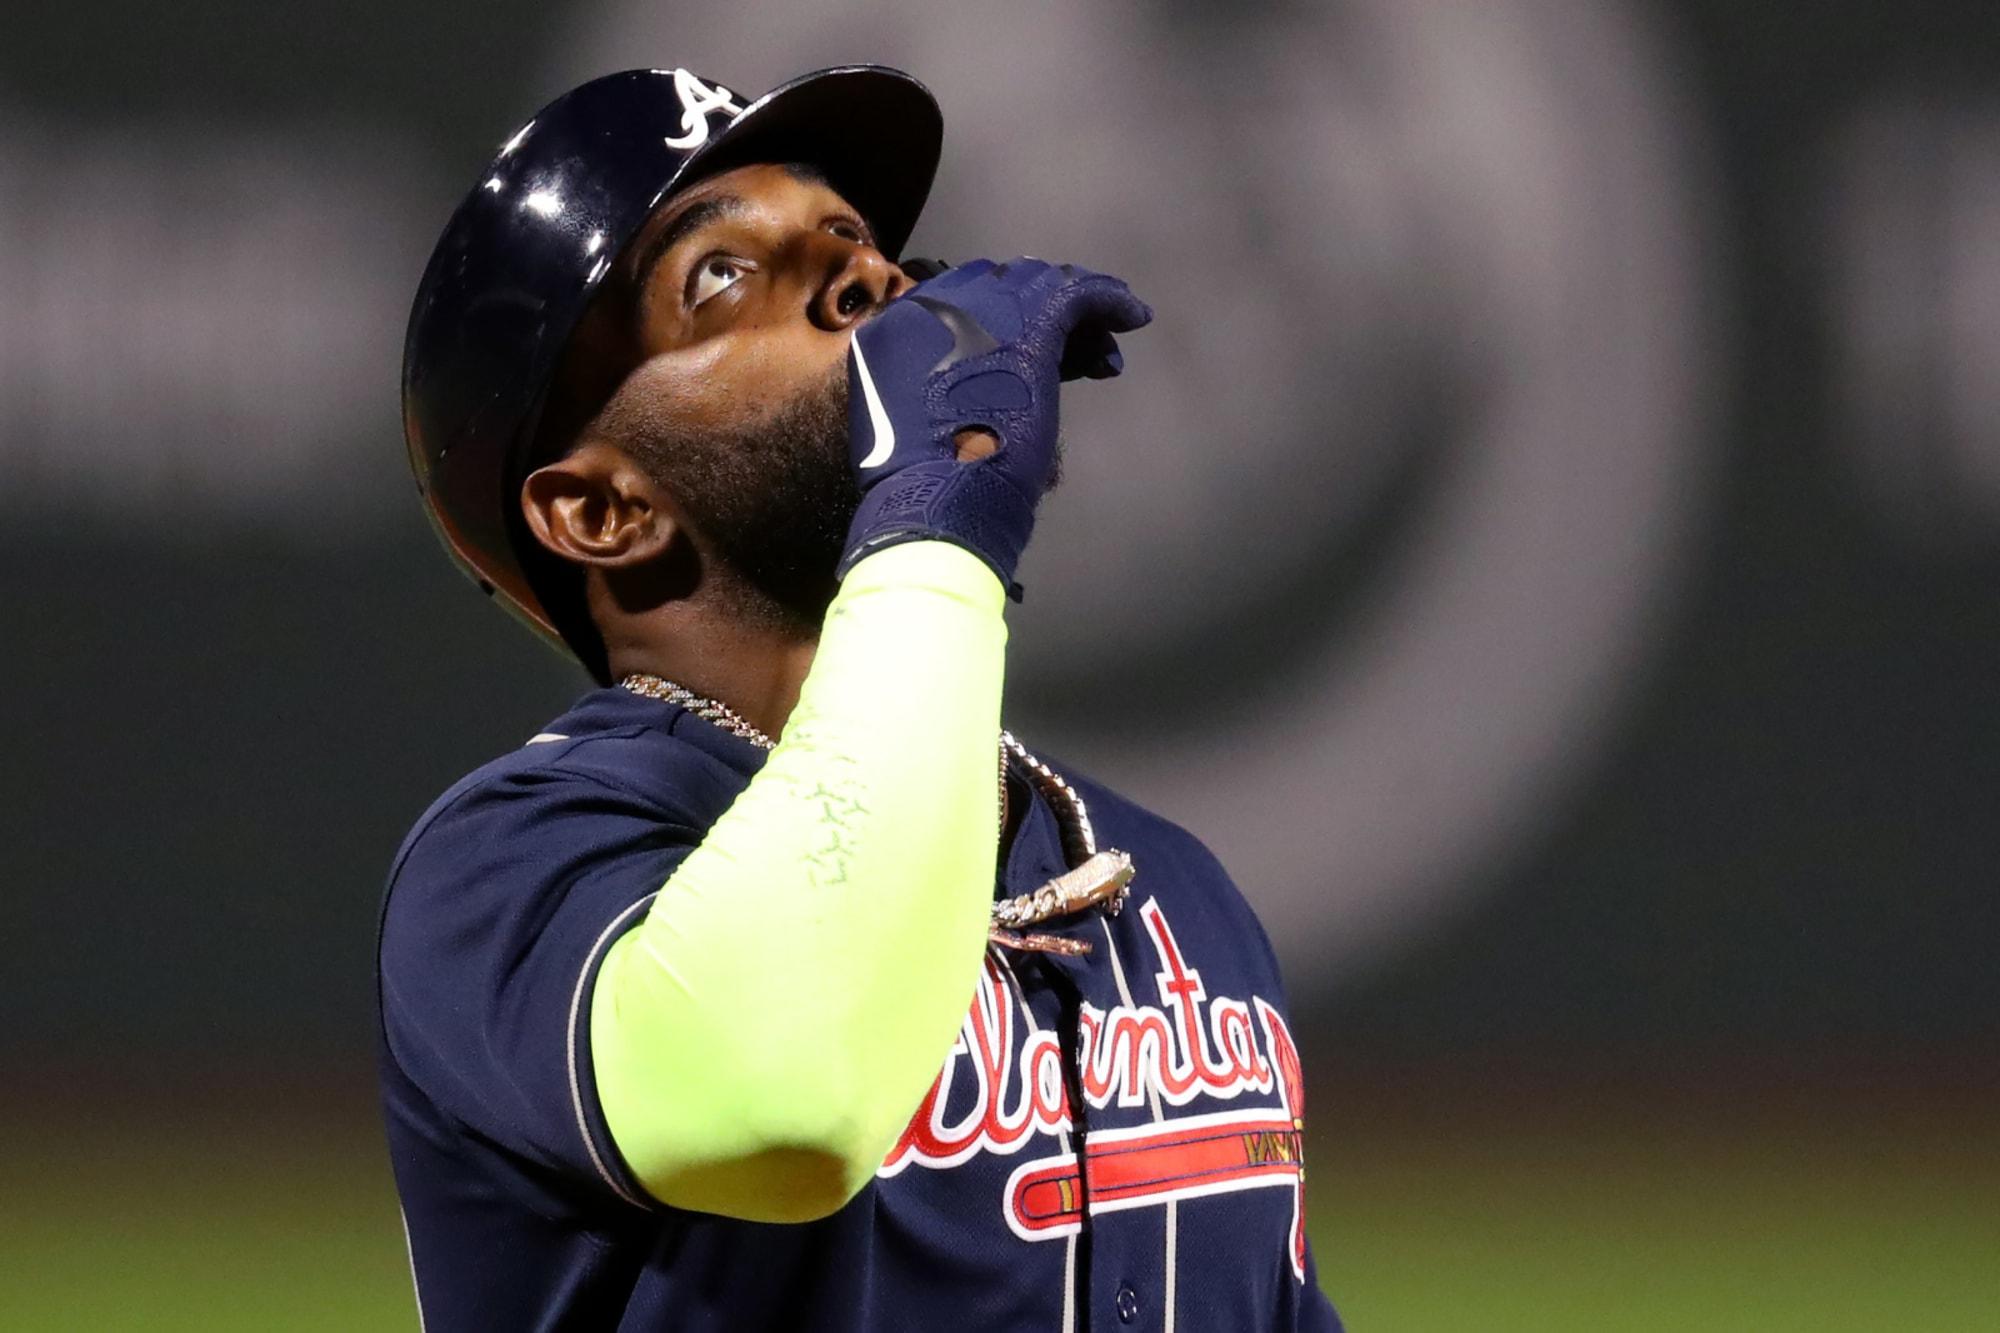 Atlanta Braves: Marcell Ozuna Hits 3 Home Runs in Win